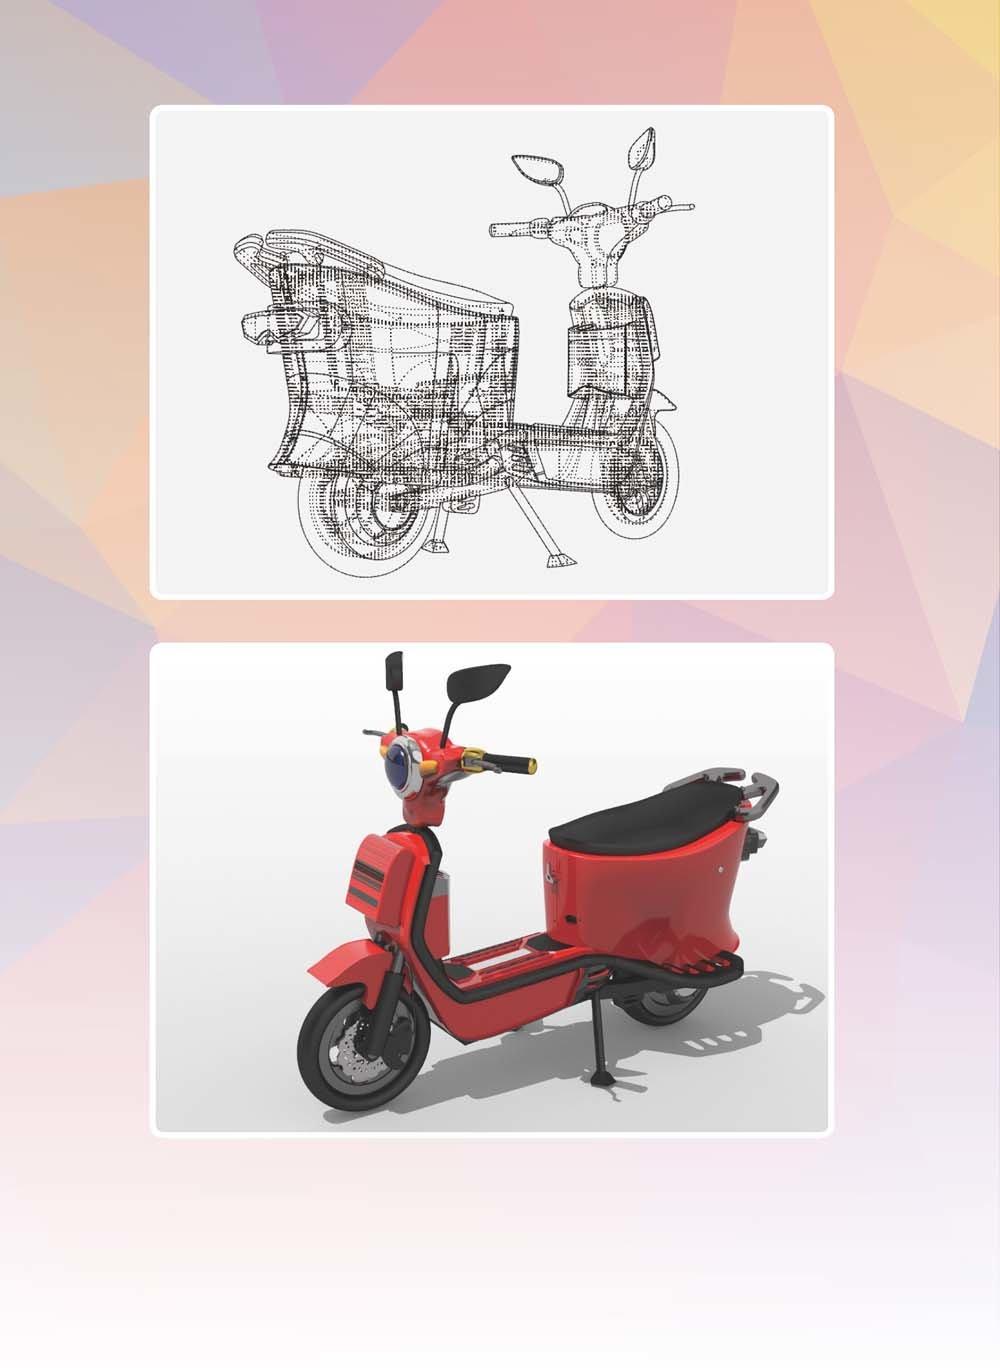 Rhinoceros 6 全攻略:自學設計與 3D建模寶典-preview-7